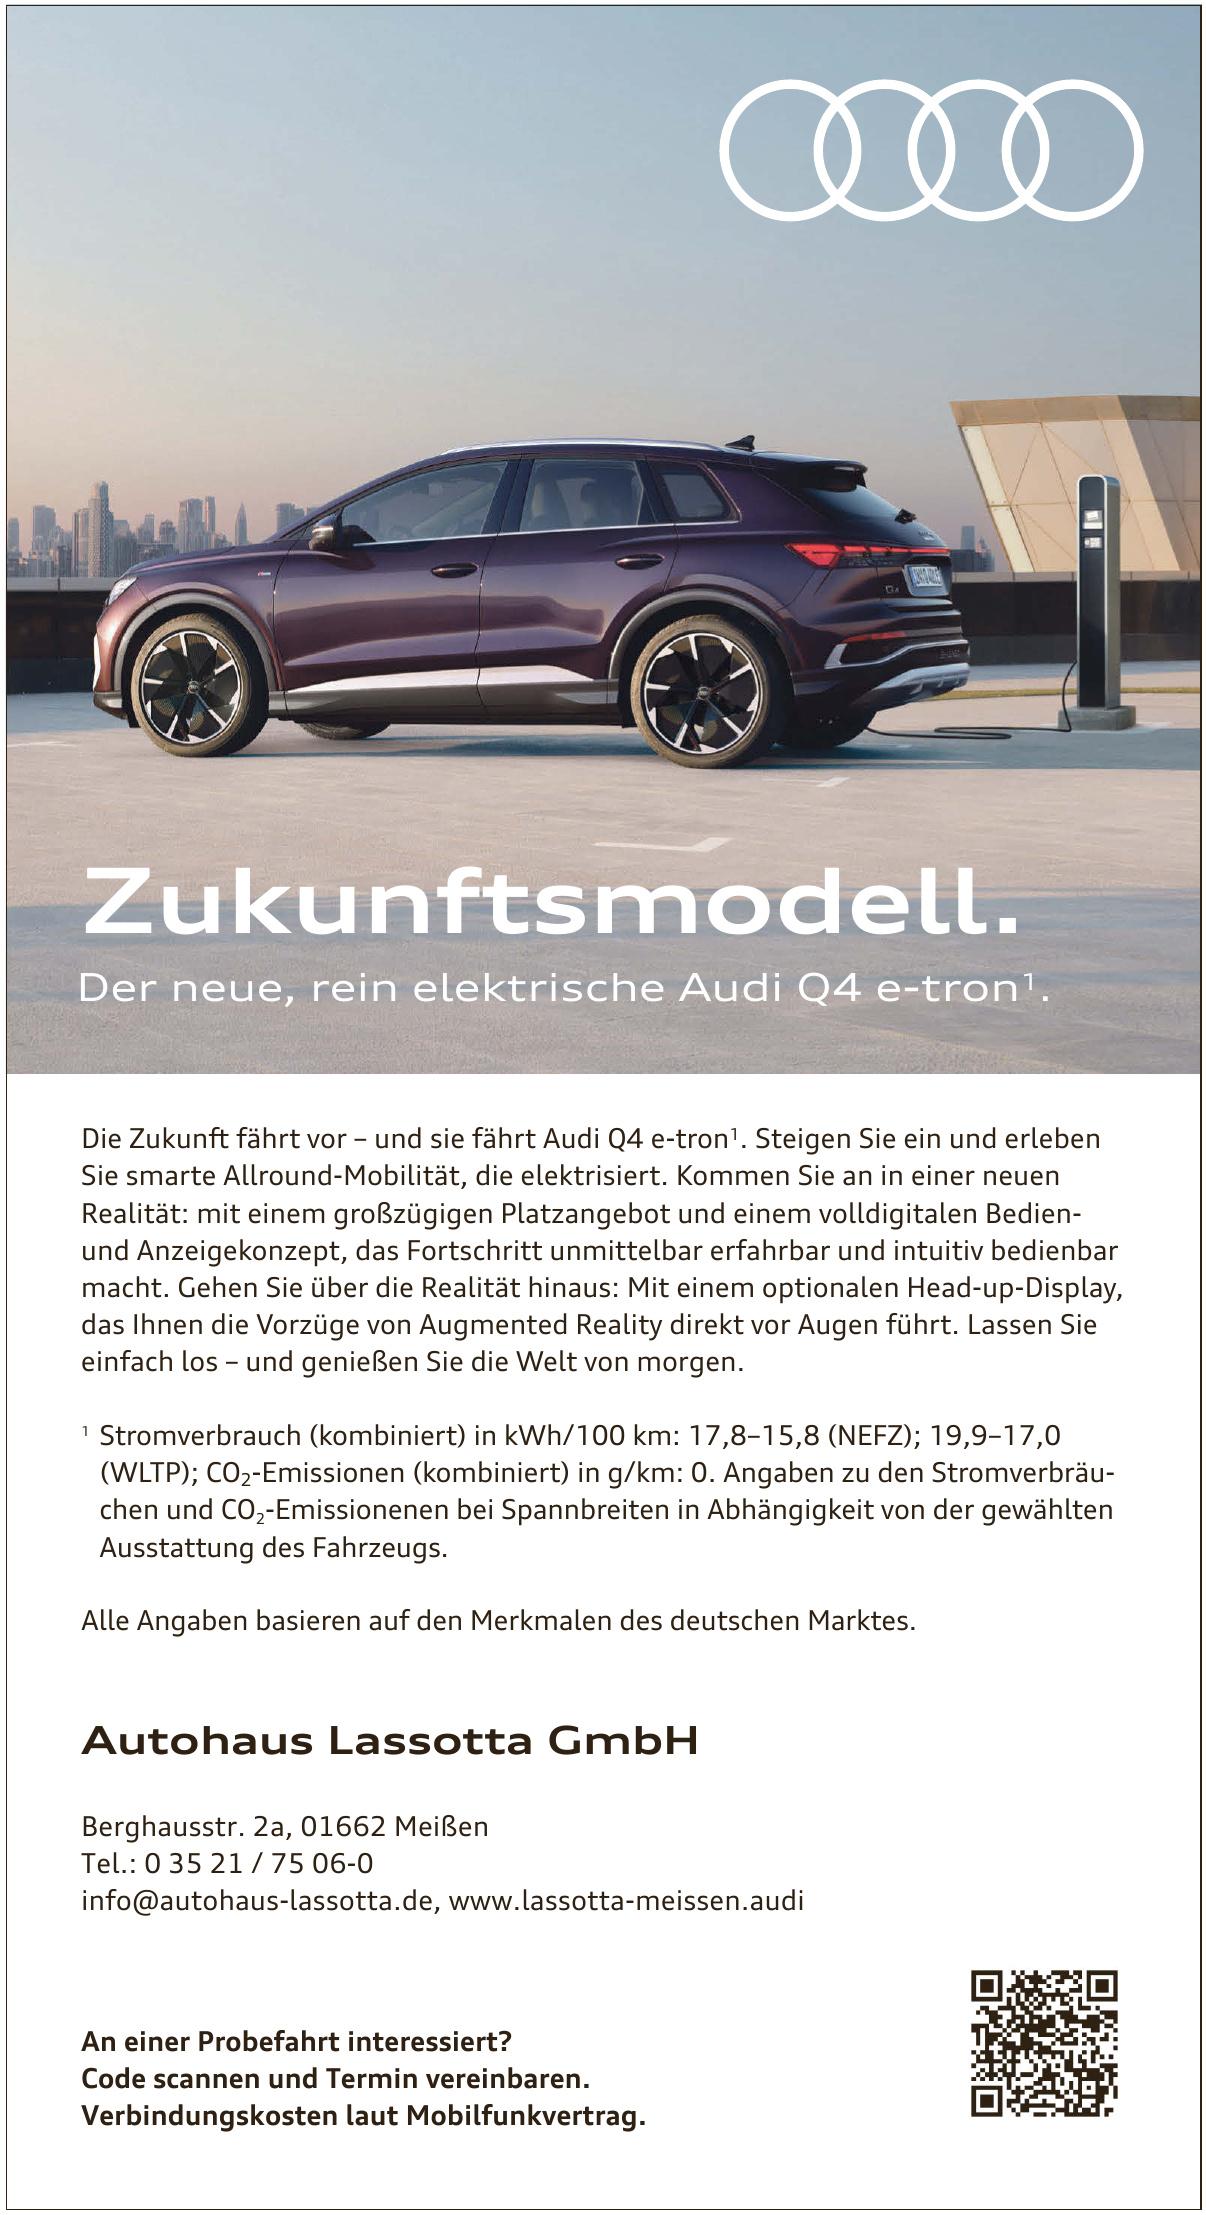 Autohaus Lassotta GmbH